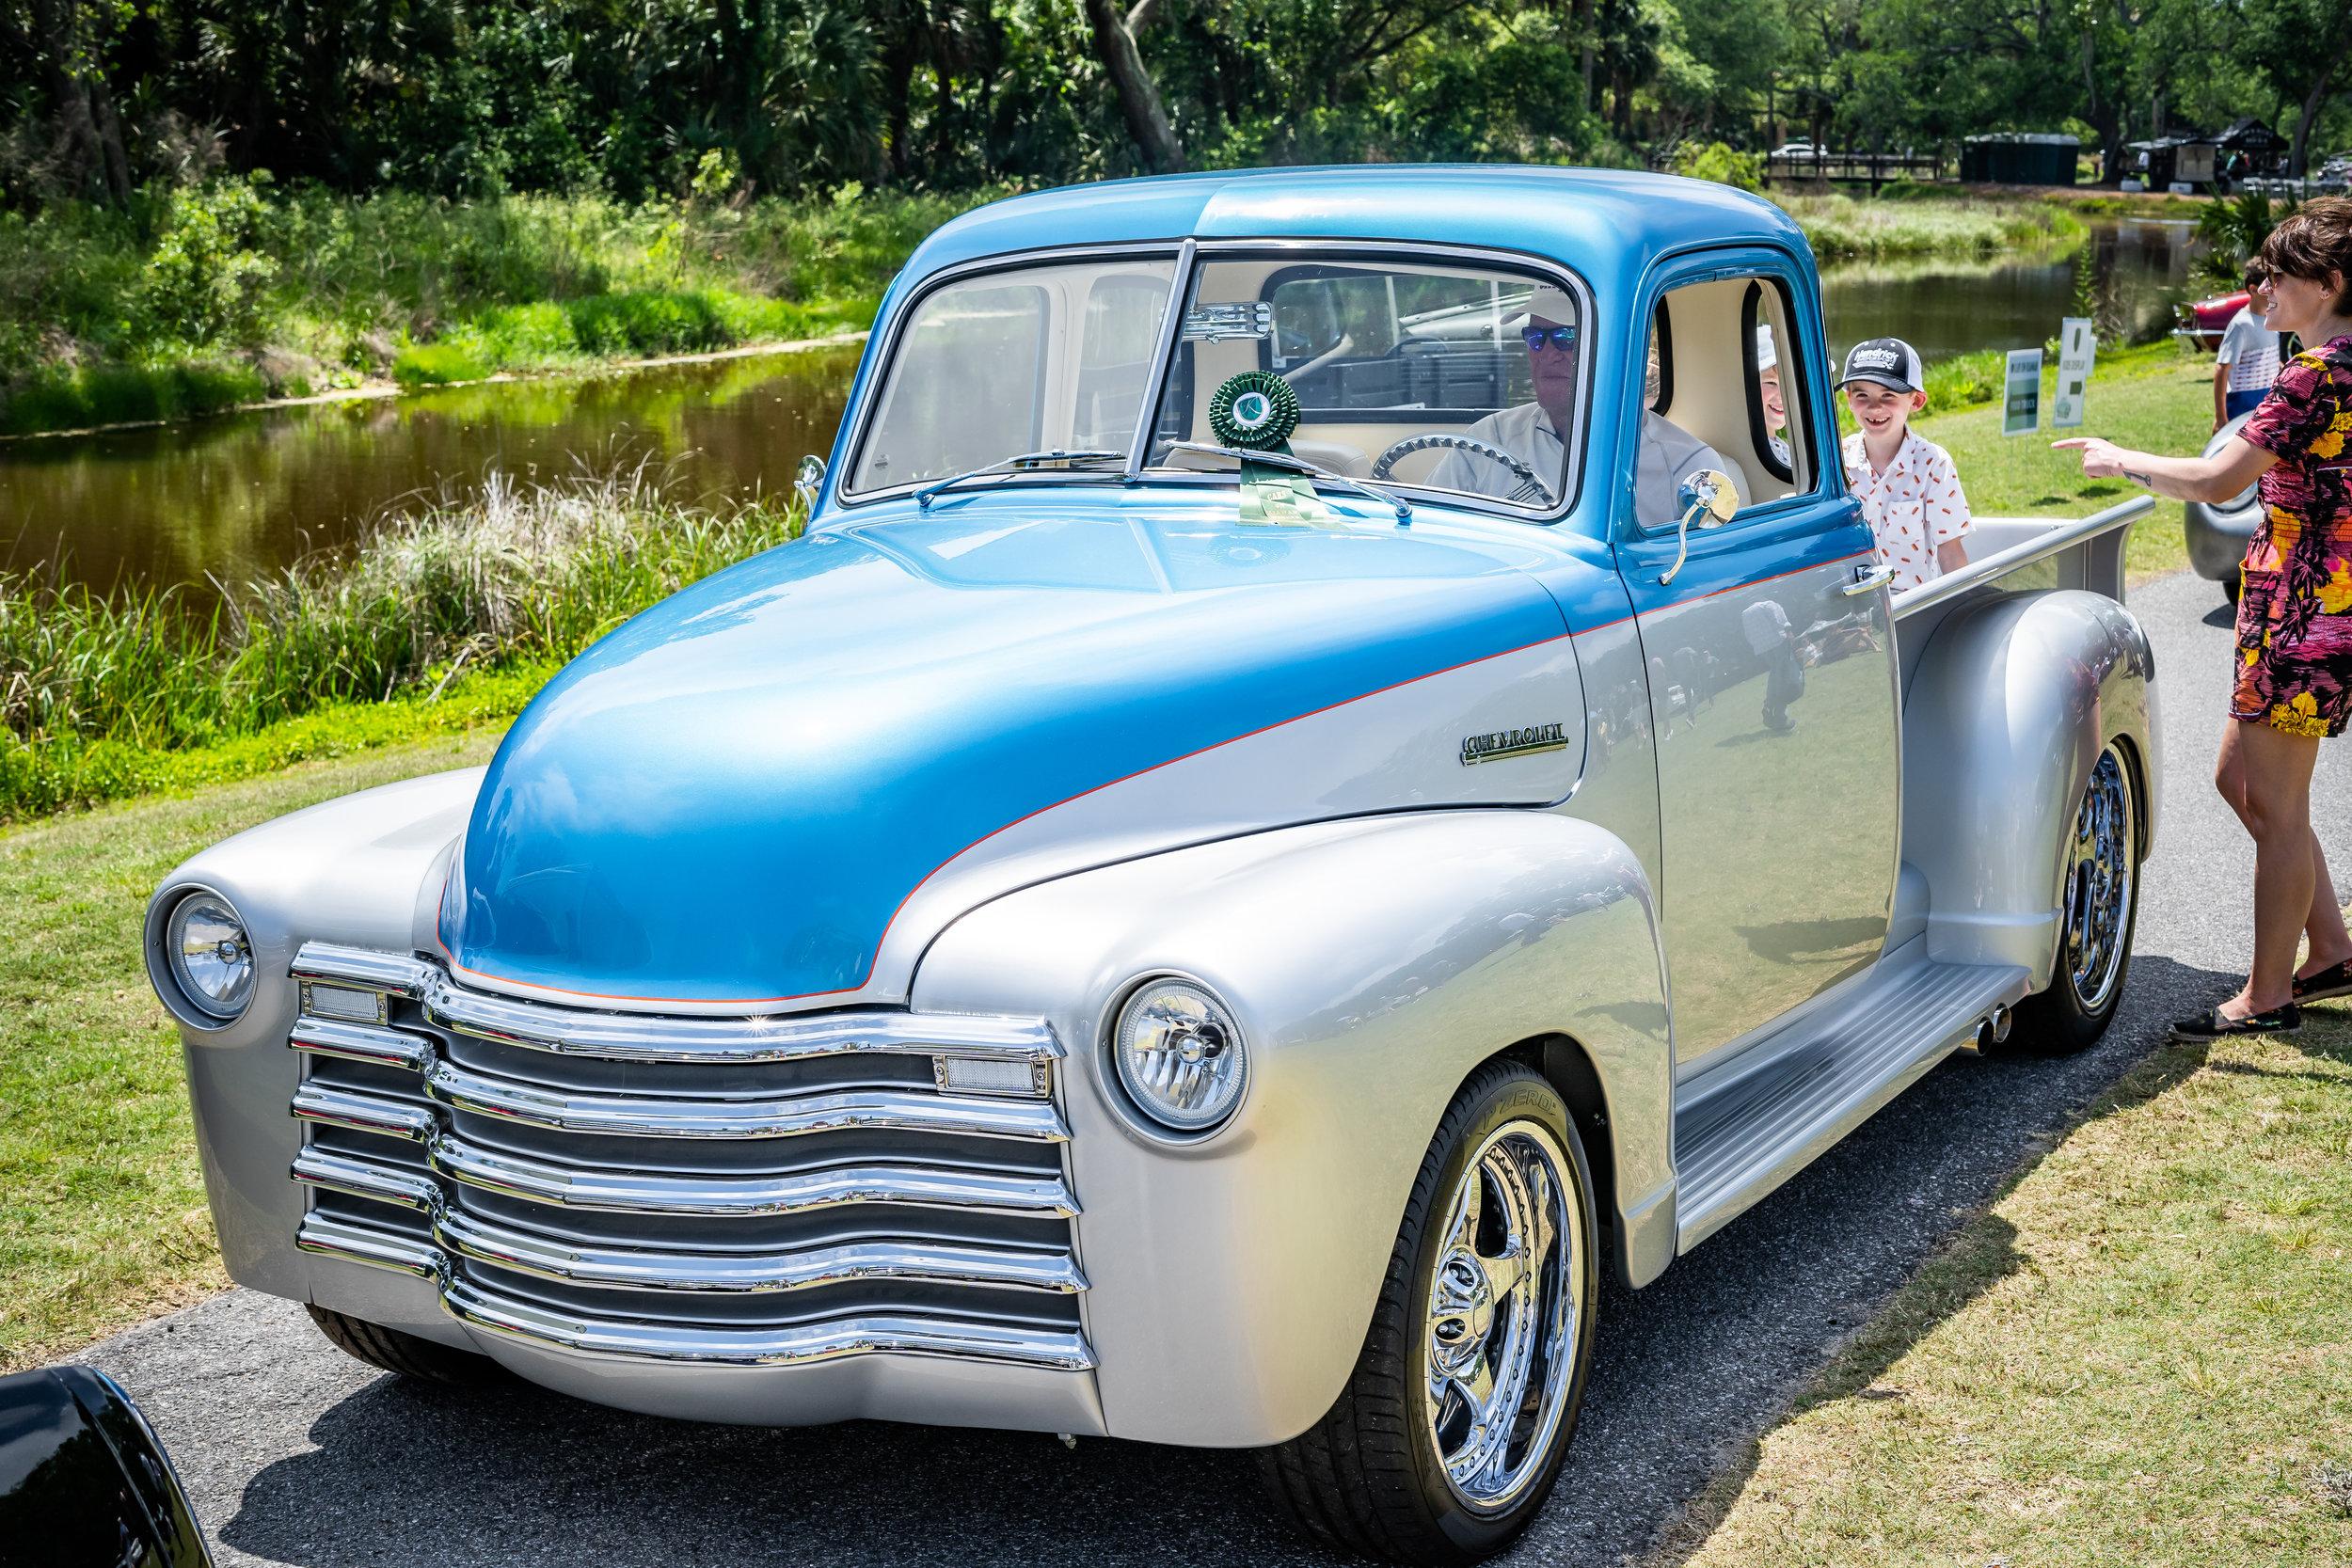 Tom Crawford (Emcee) Award - Gary Lawson's '51 Chevy 3100 Pickup